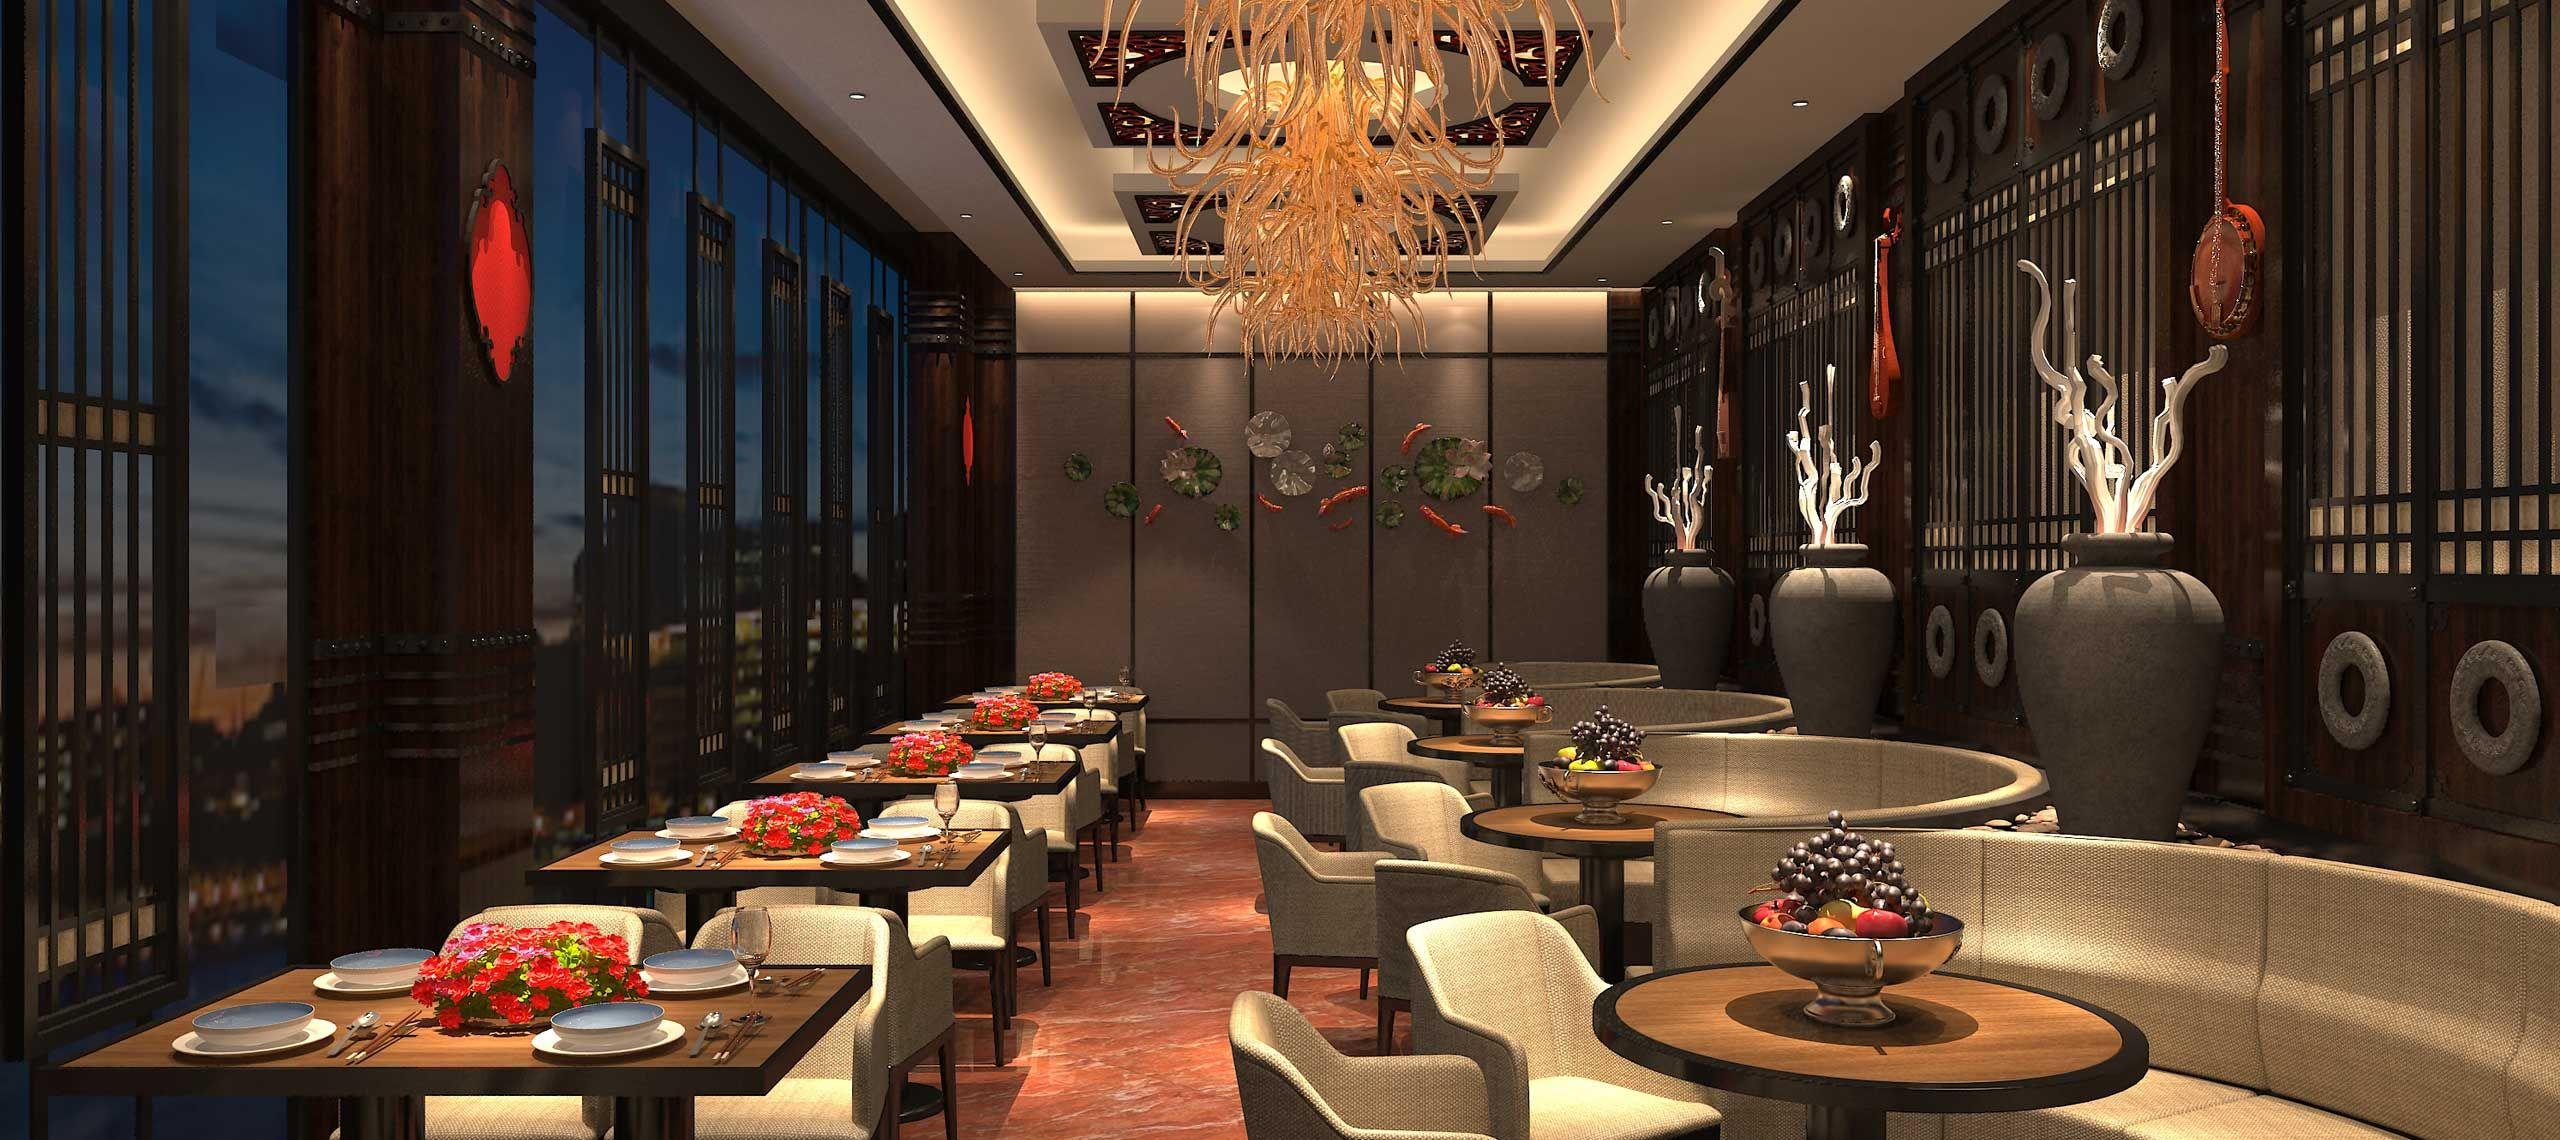 Kontakt - Chinarestaurant Asiamo Gourmet